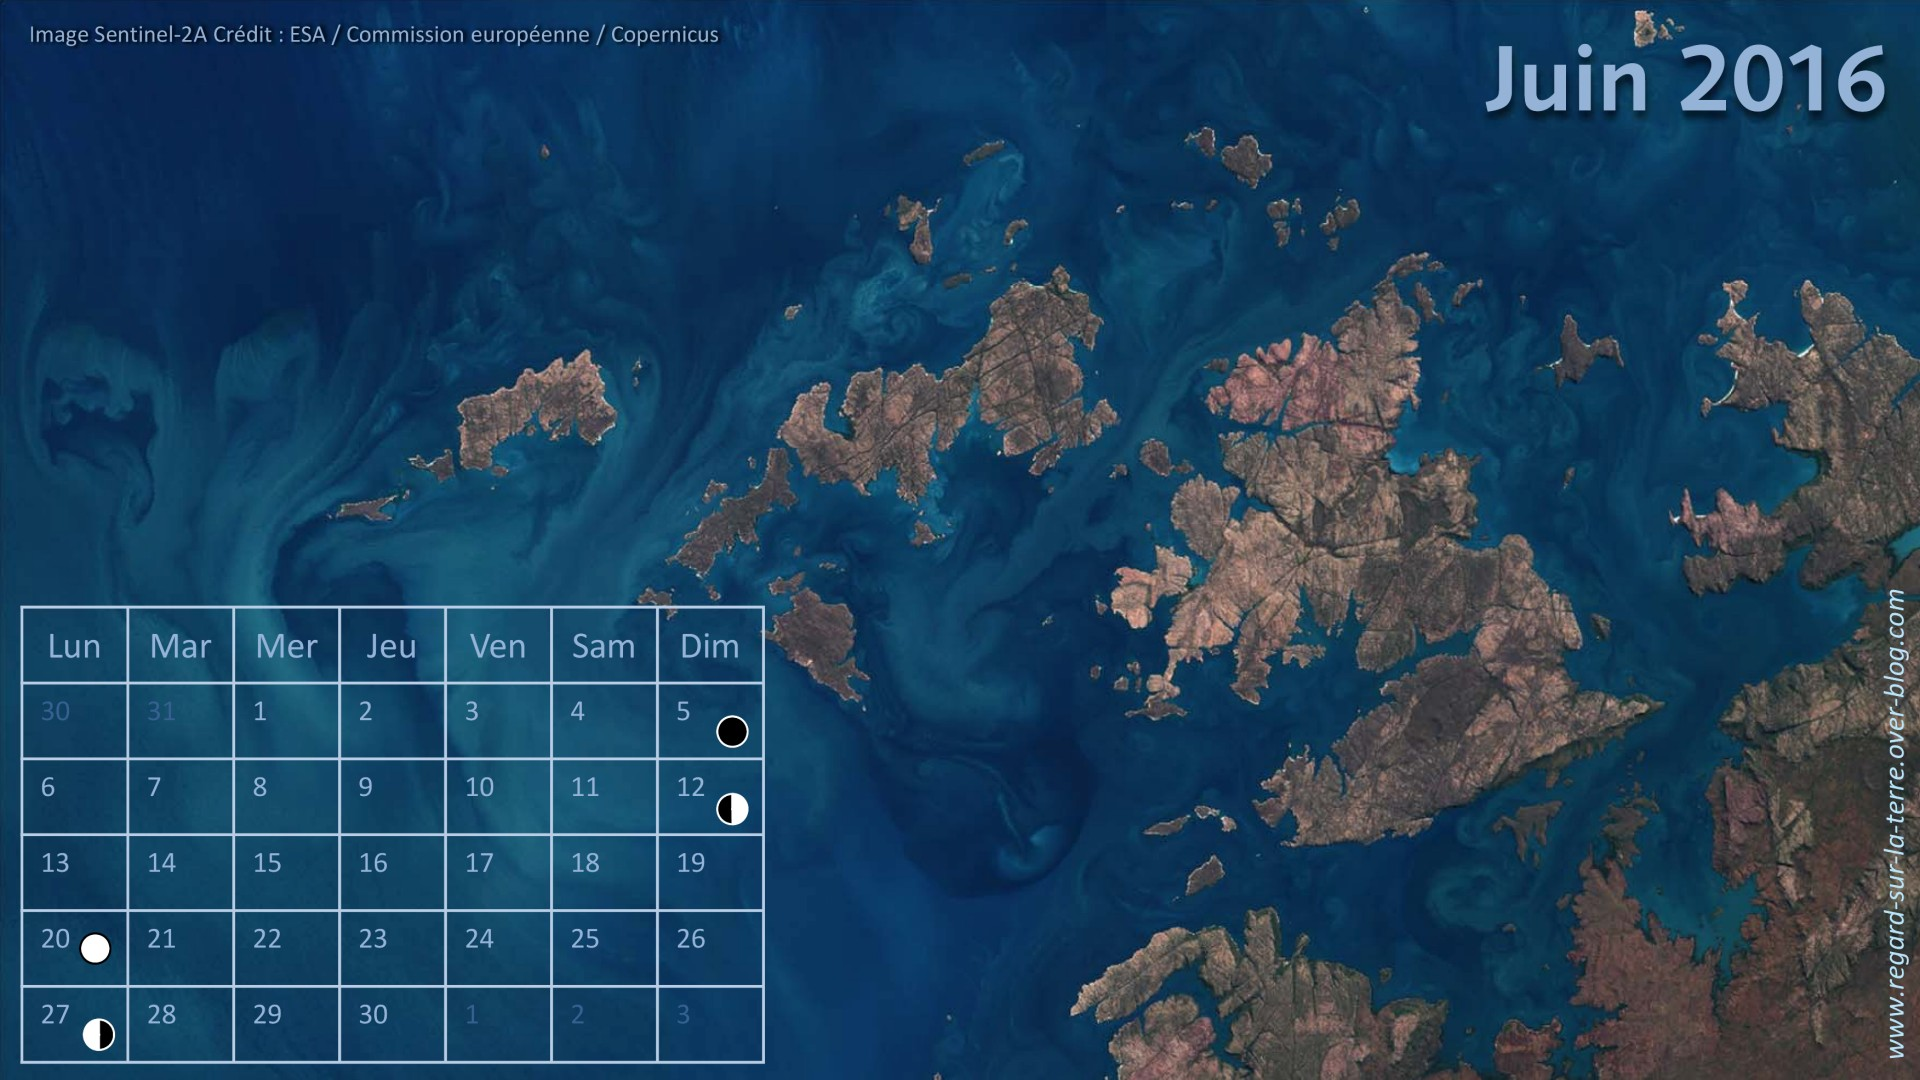 Calendrier spatial - Juin 2016 - Sentinel-2 - ESA - Copernicus - Australie - Kimberley - Derby - Prince Regent Reserve - UNESCO